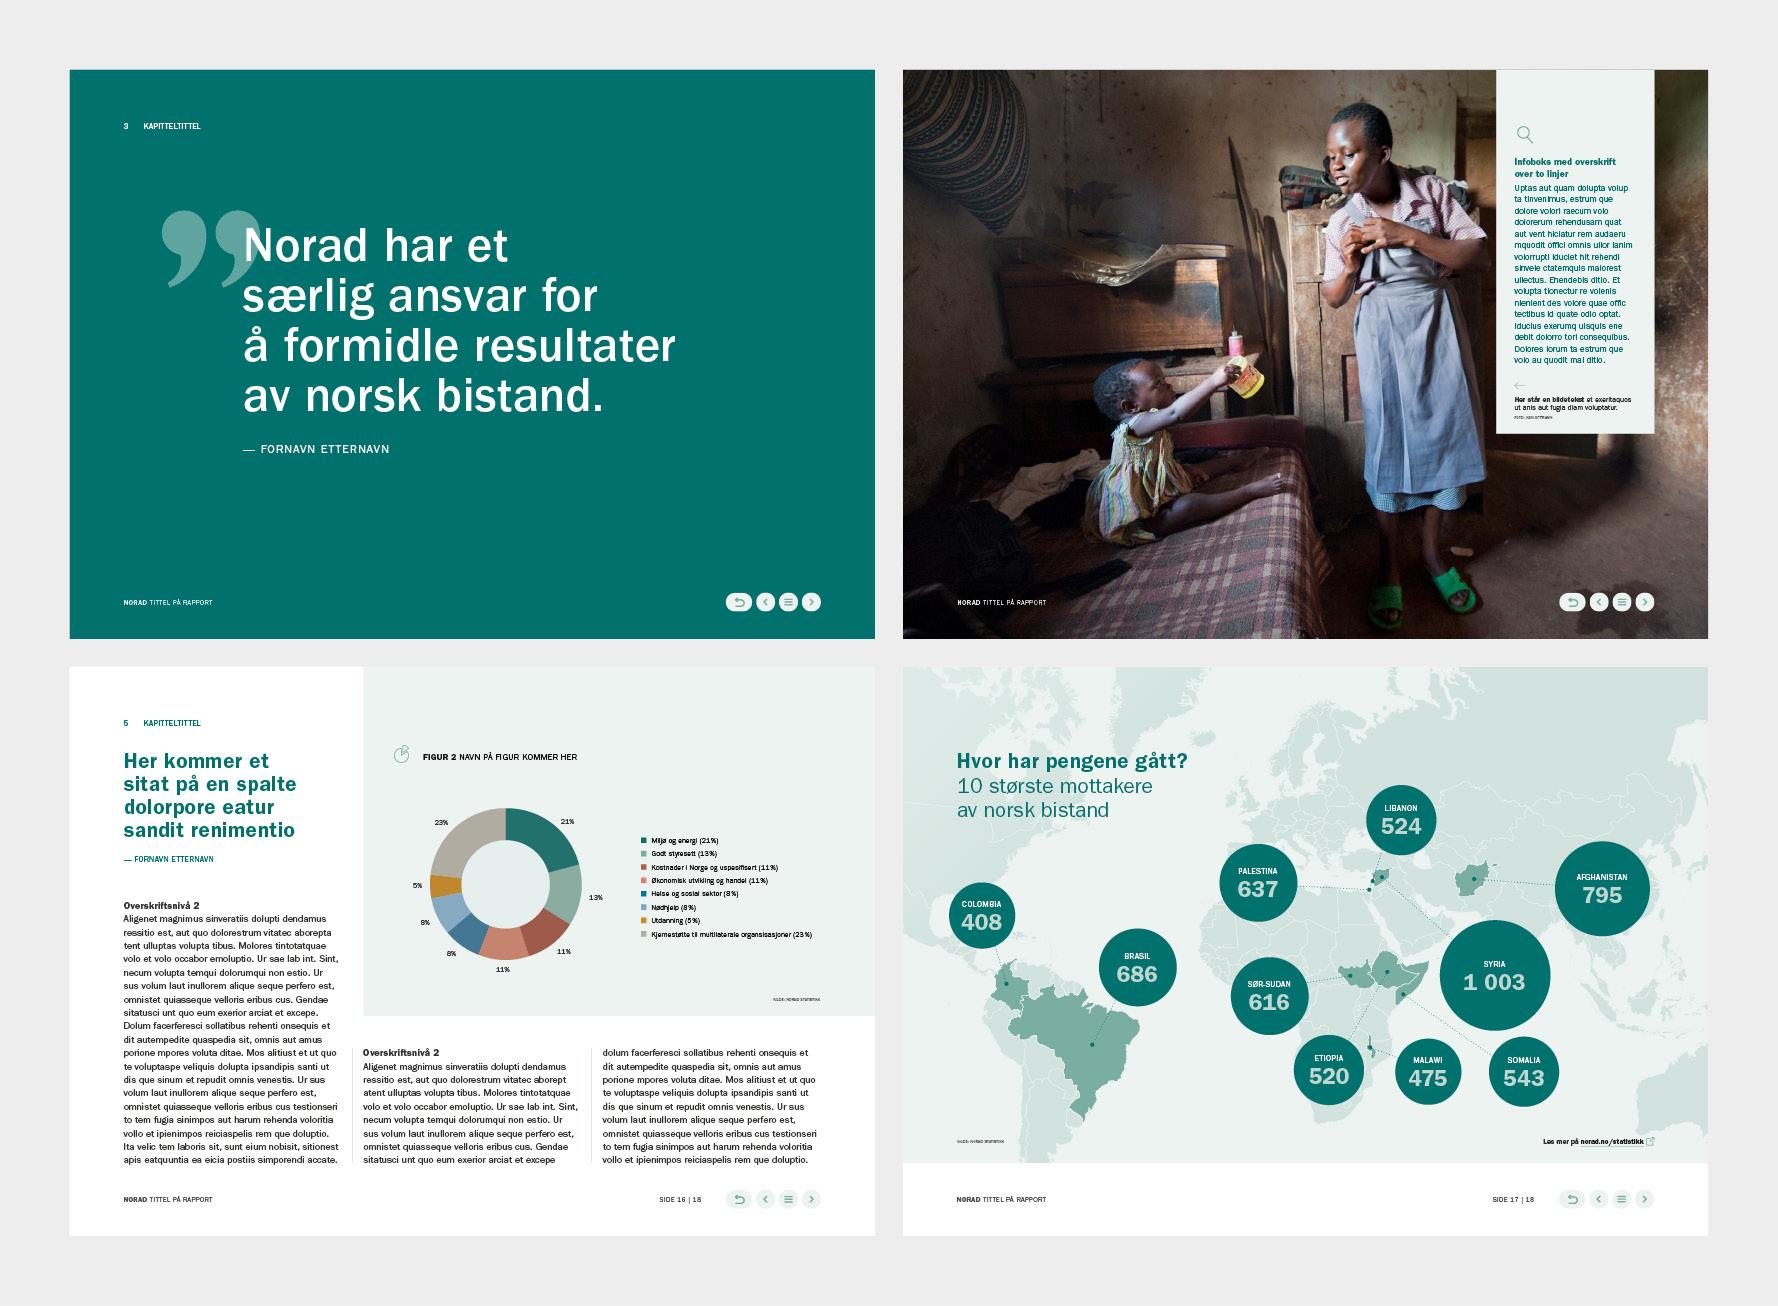 Norad rapport fire forskjellige sider